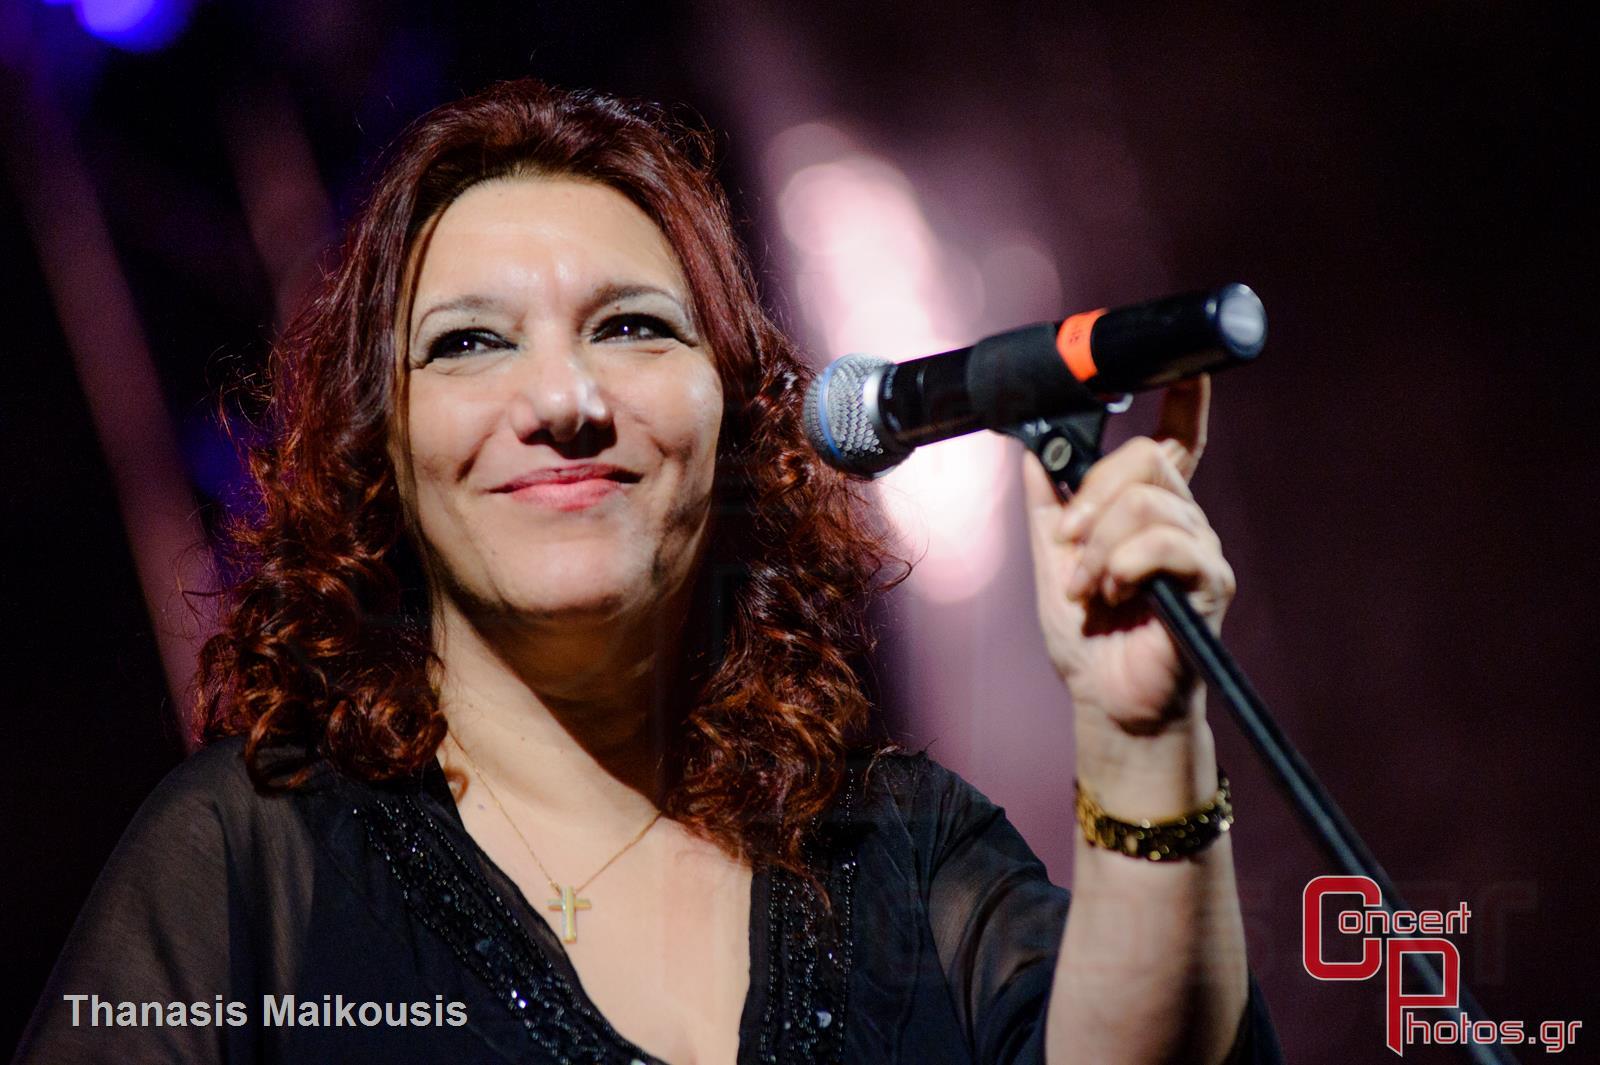 Active Member - Τραγούδα μας να φύγει το σκοτάδι- photographer: Thanasis Maikousis - concertphotos_-5588